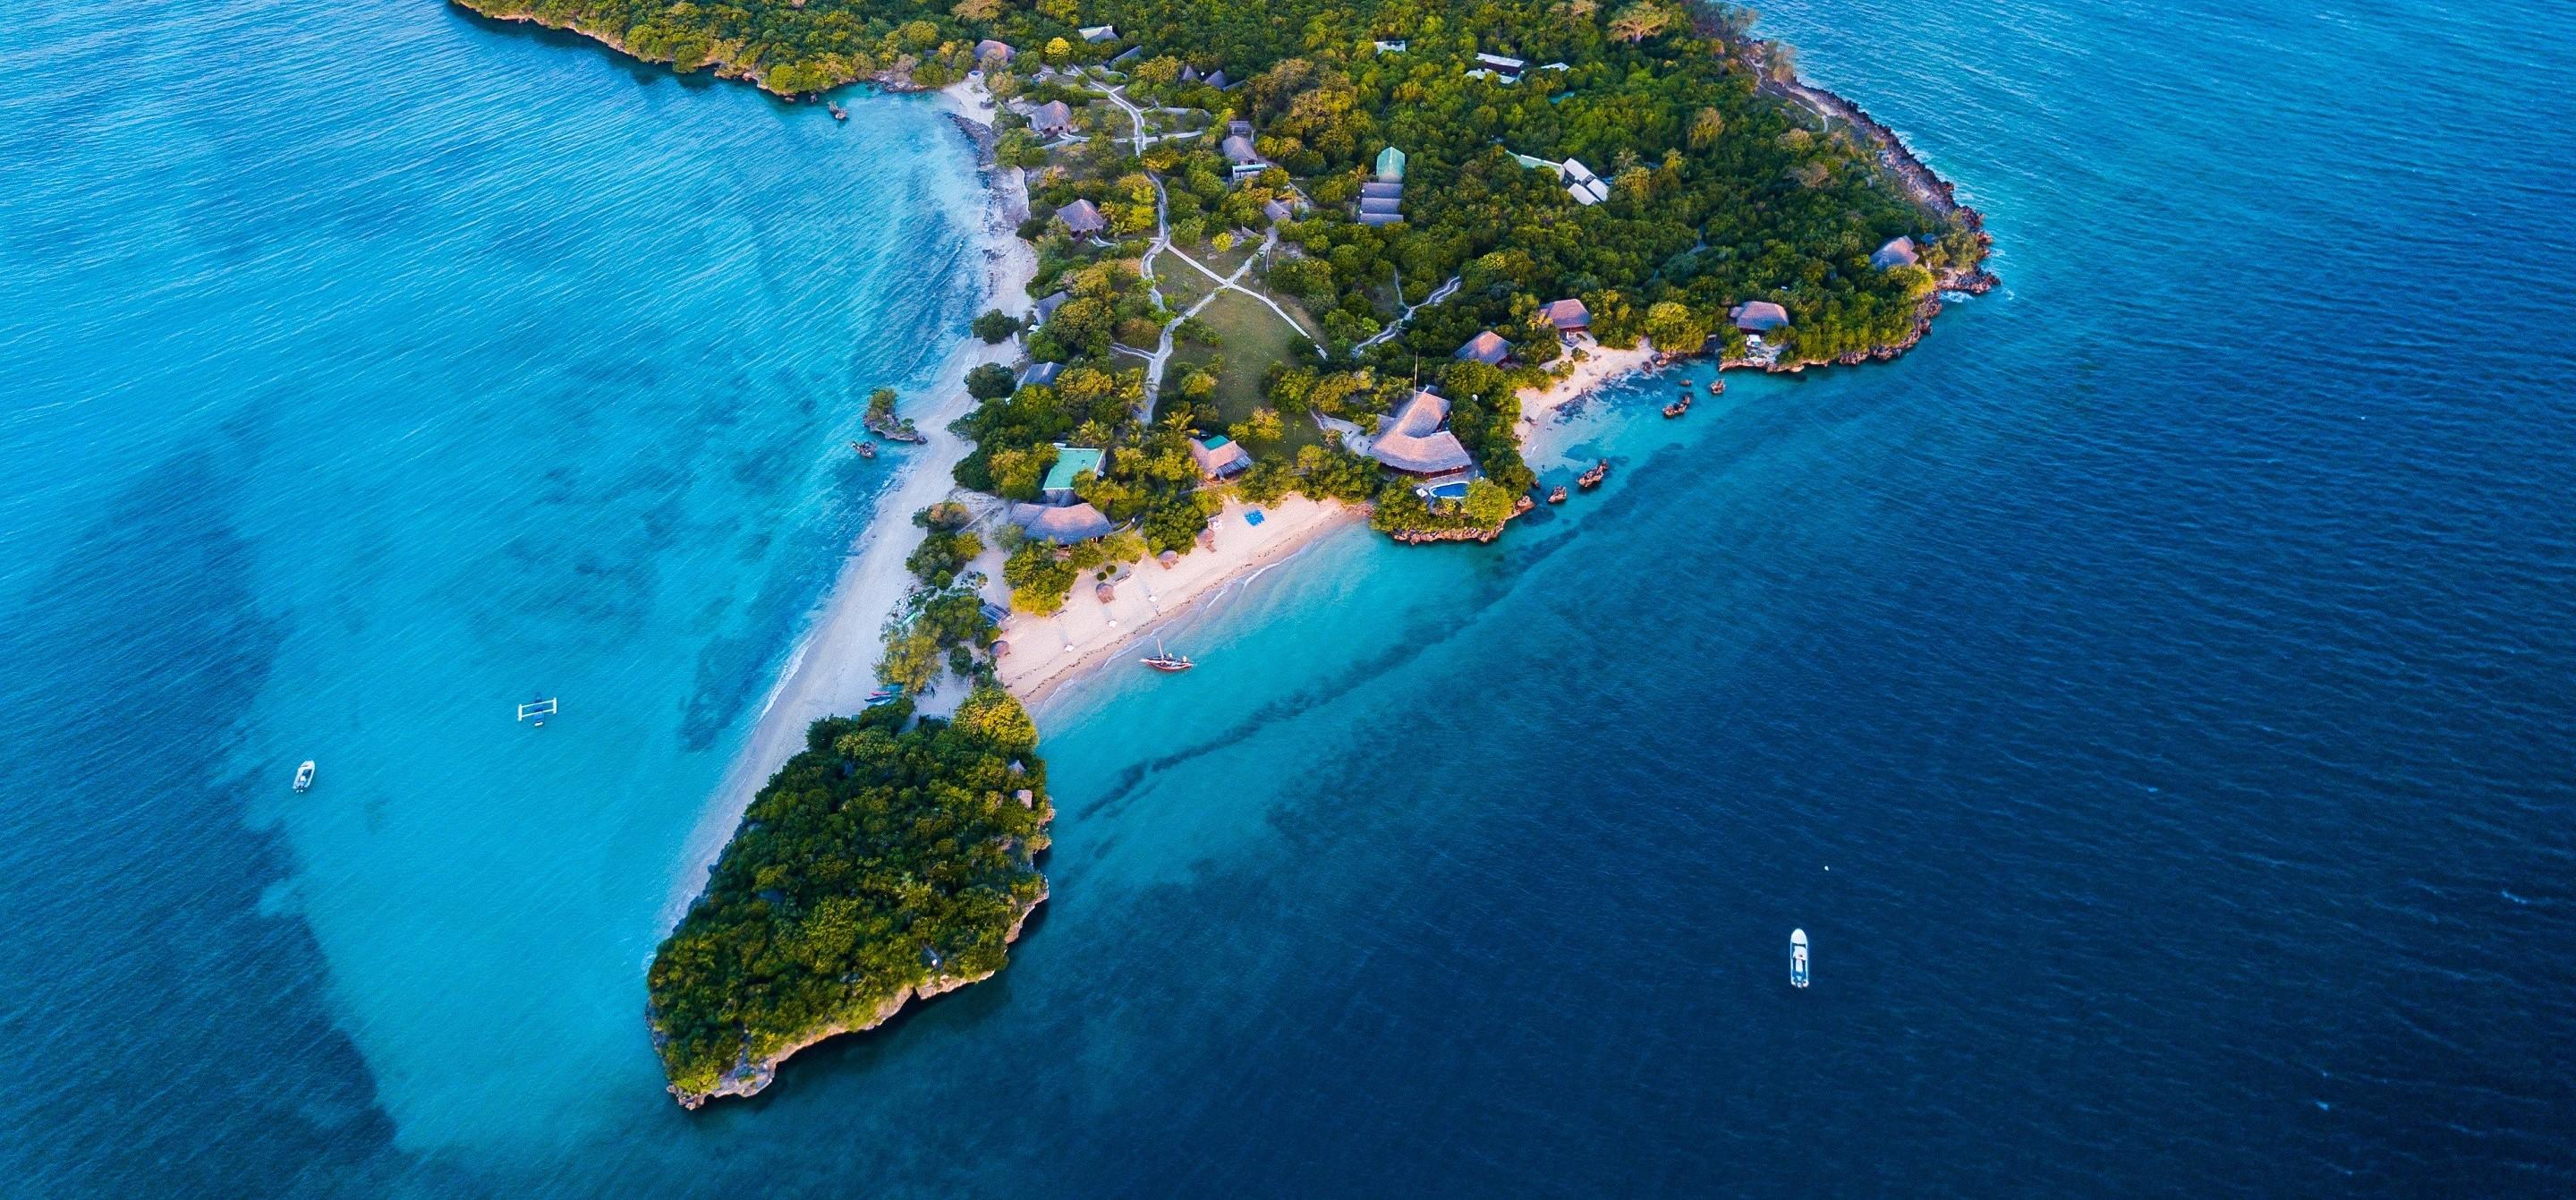 azura_quilalea_private_island_aerial